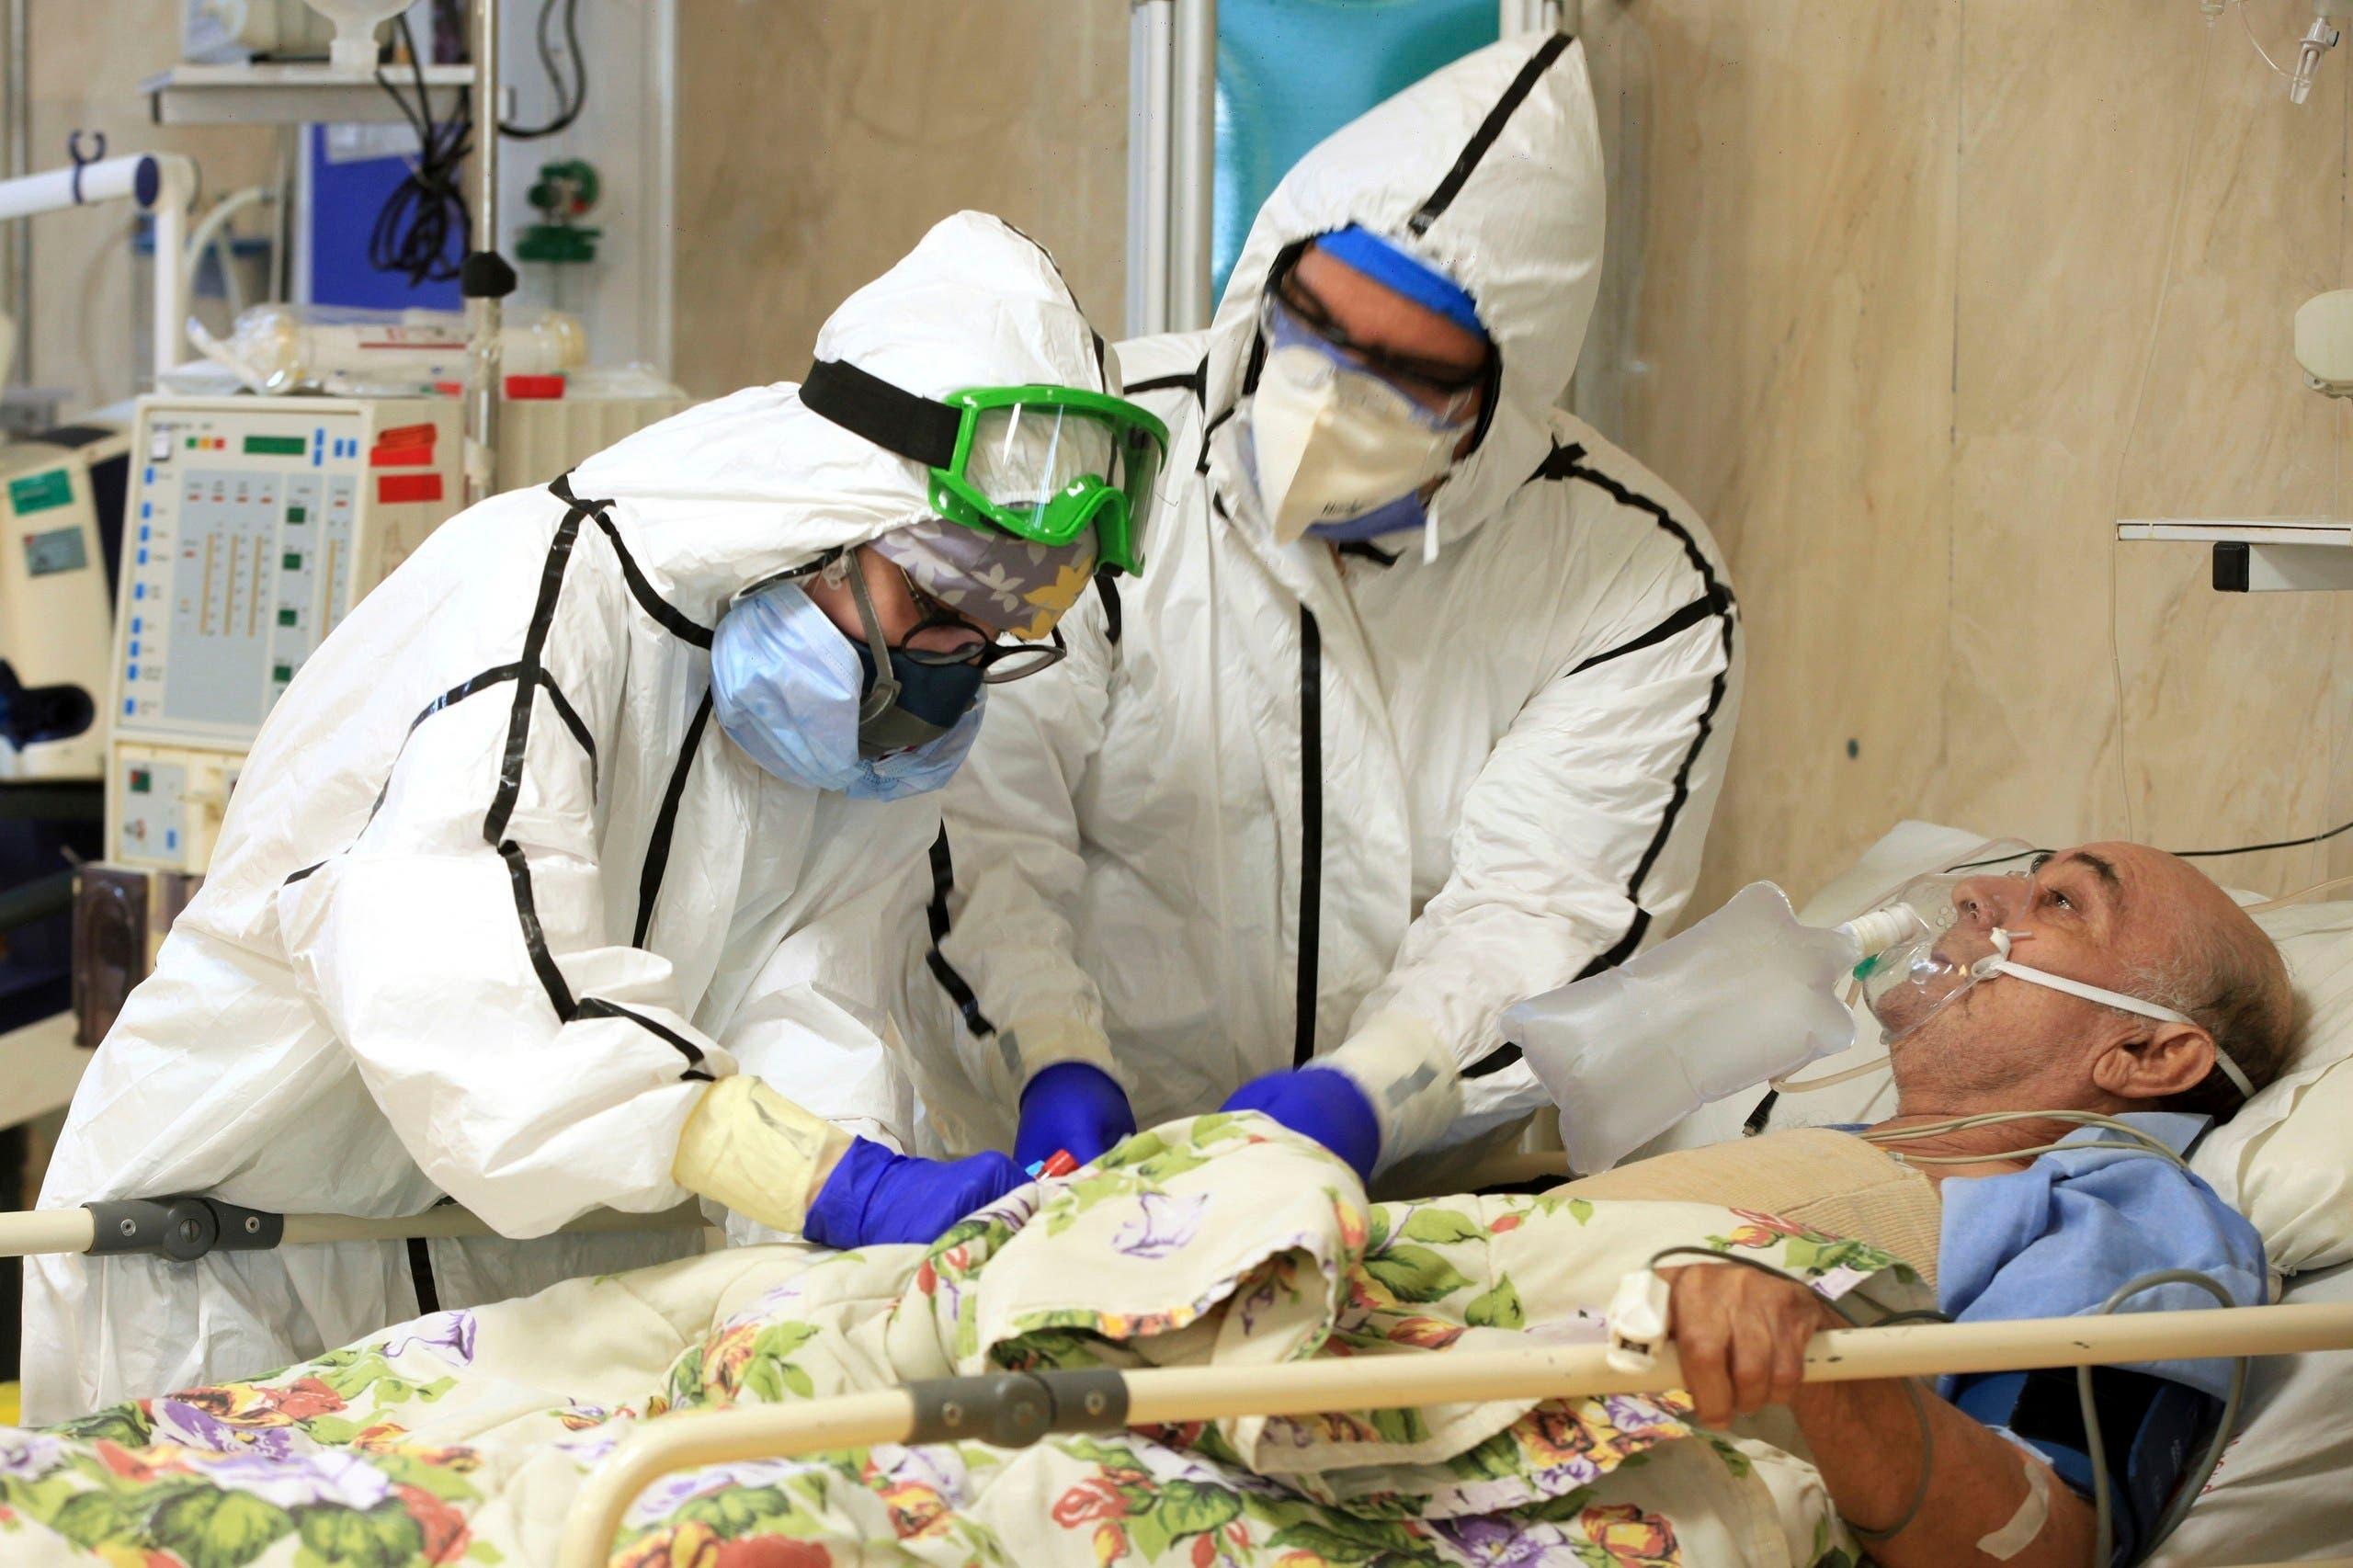 Medics tend to a COVID-19 patient at the Shohadaye Tajrish Hospital in Tehran, Iran. (File photo: AP)